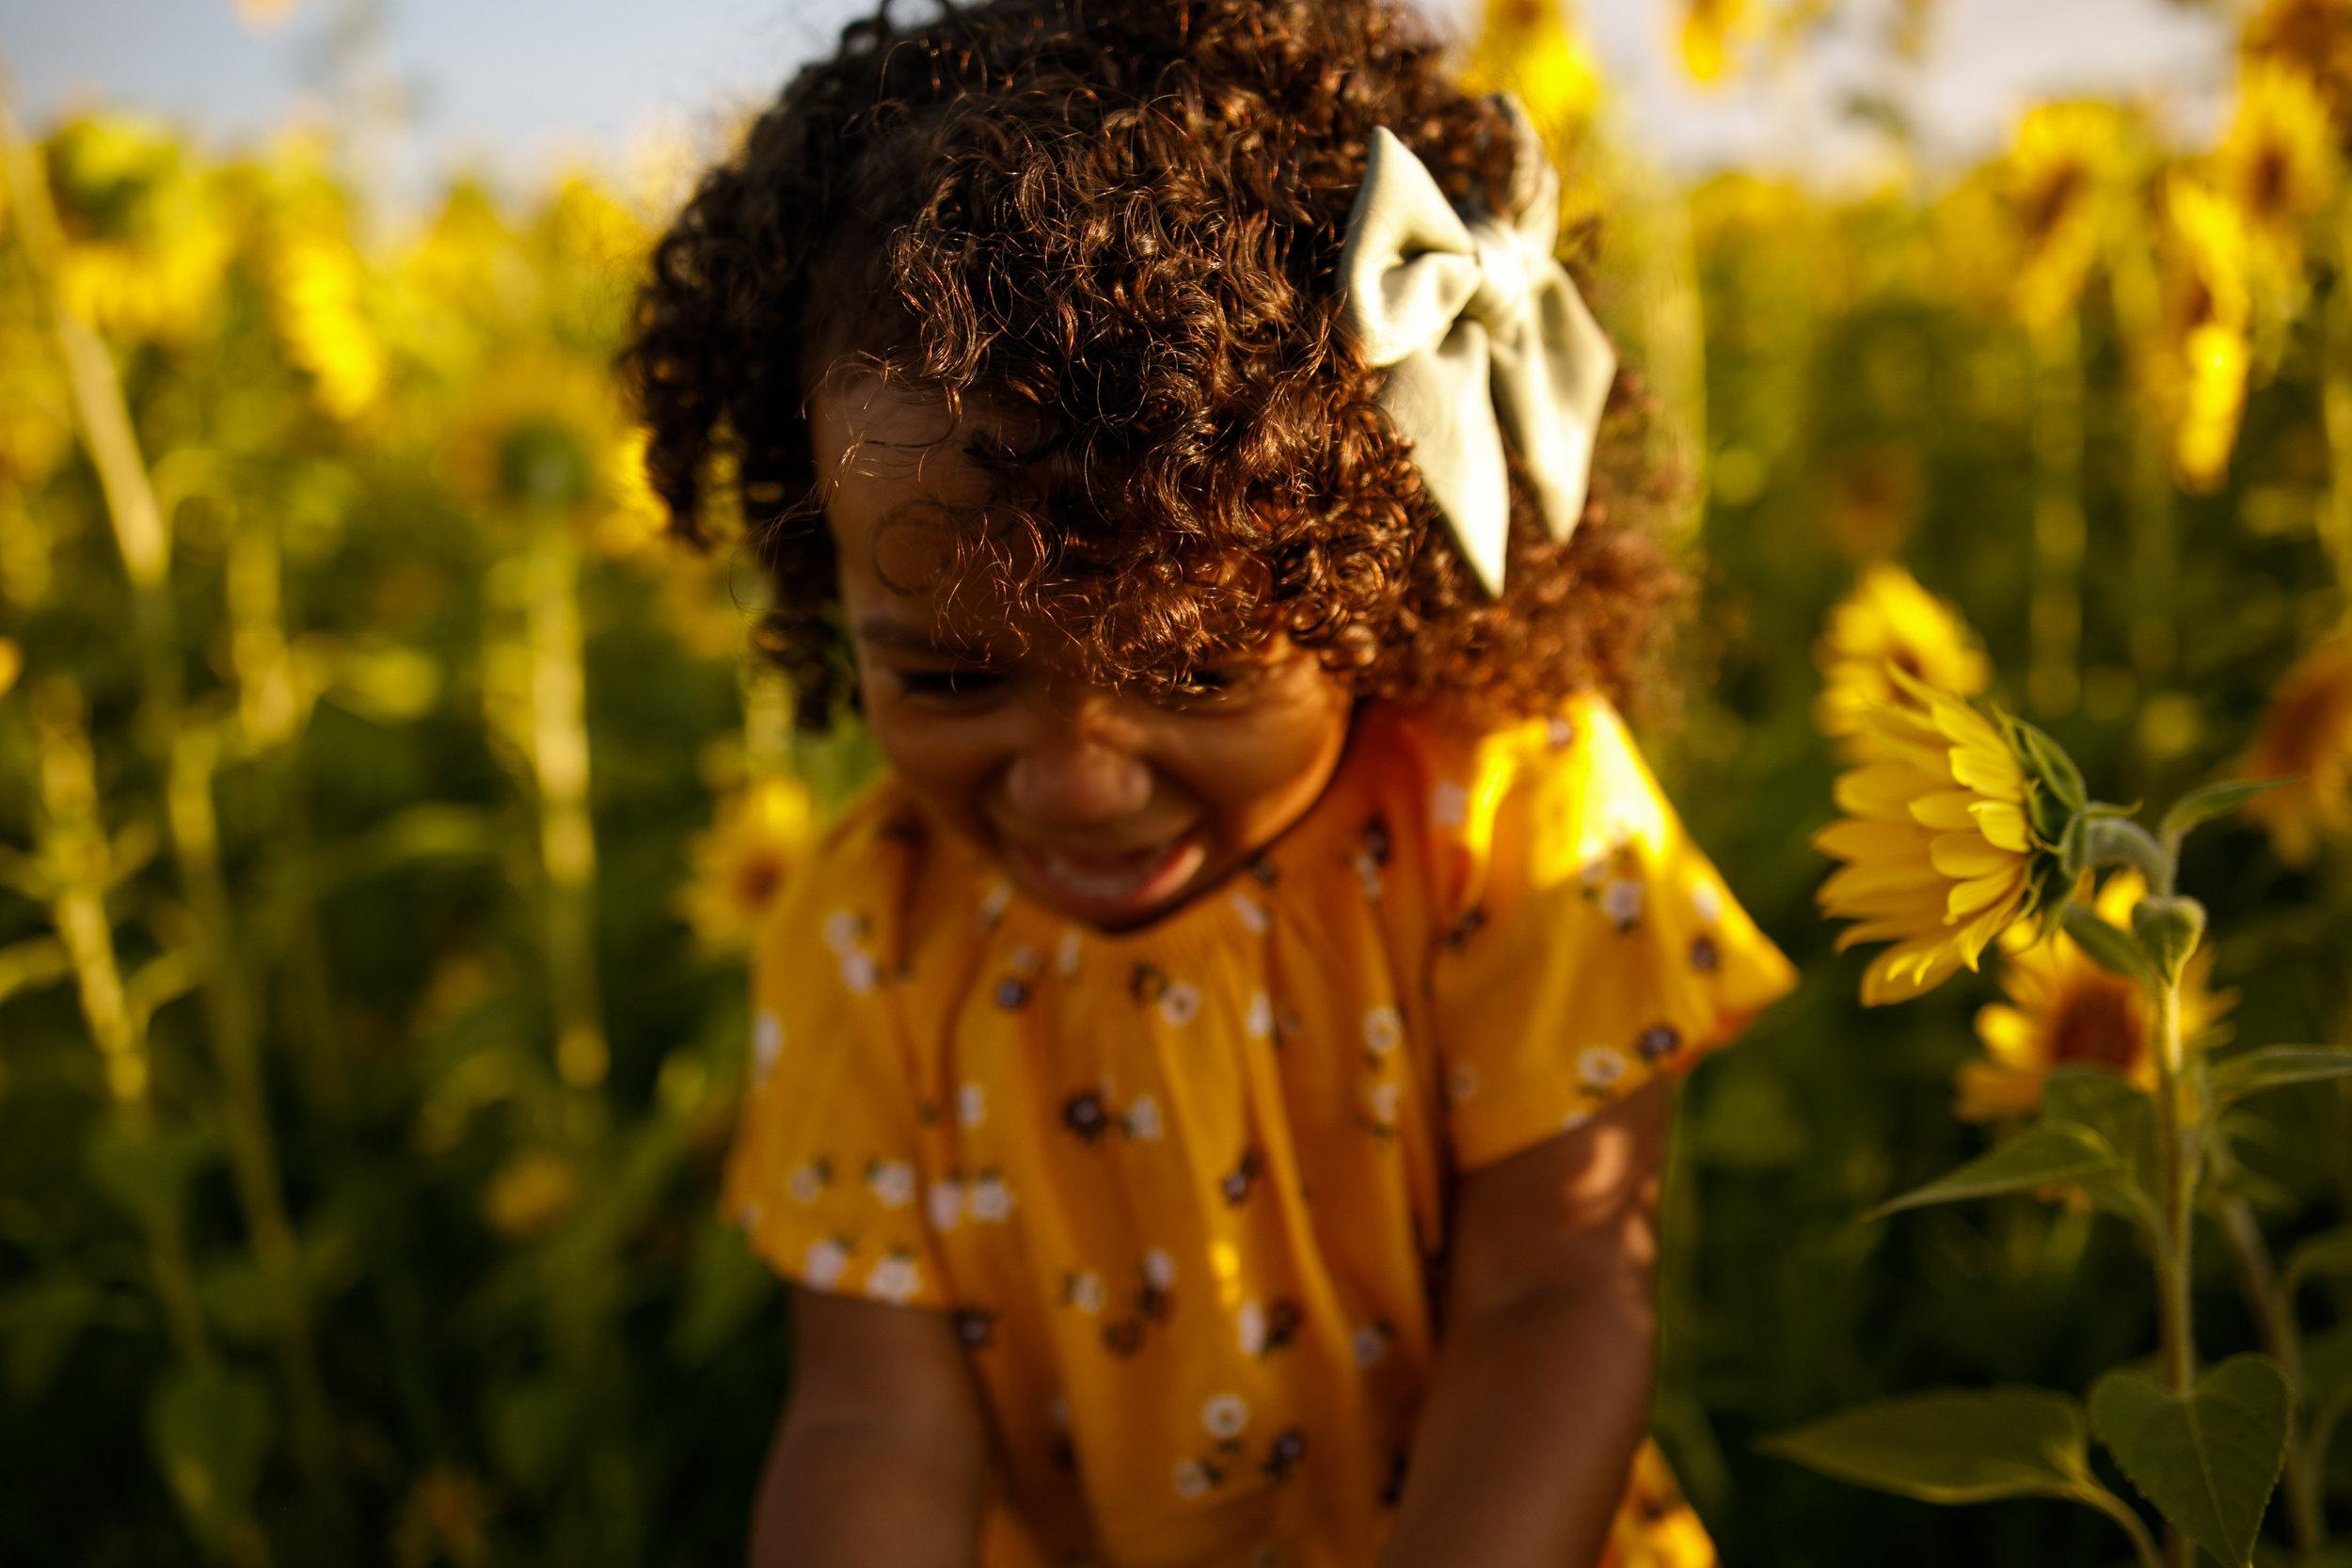 Morris Family Summer 2019 - Grand Rapids Photographer - Grand Rapids Family Photographer - Ed Dunneback and Girls - J Darling Photo 002.jpg